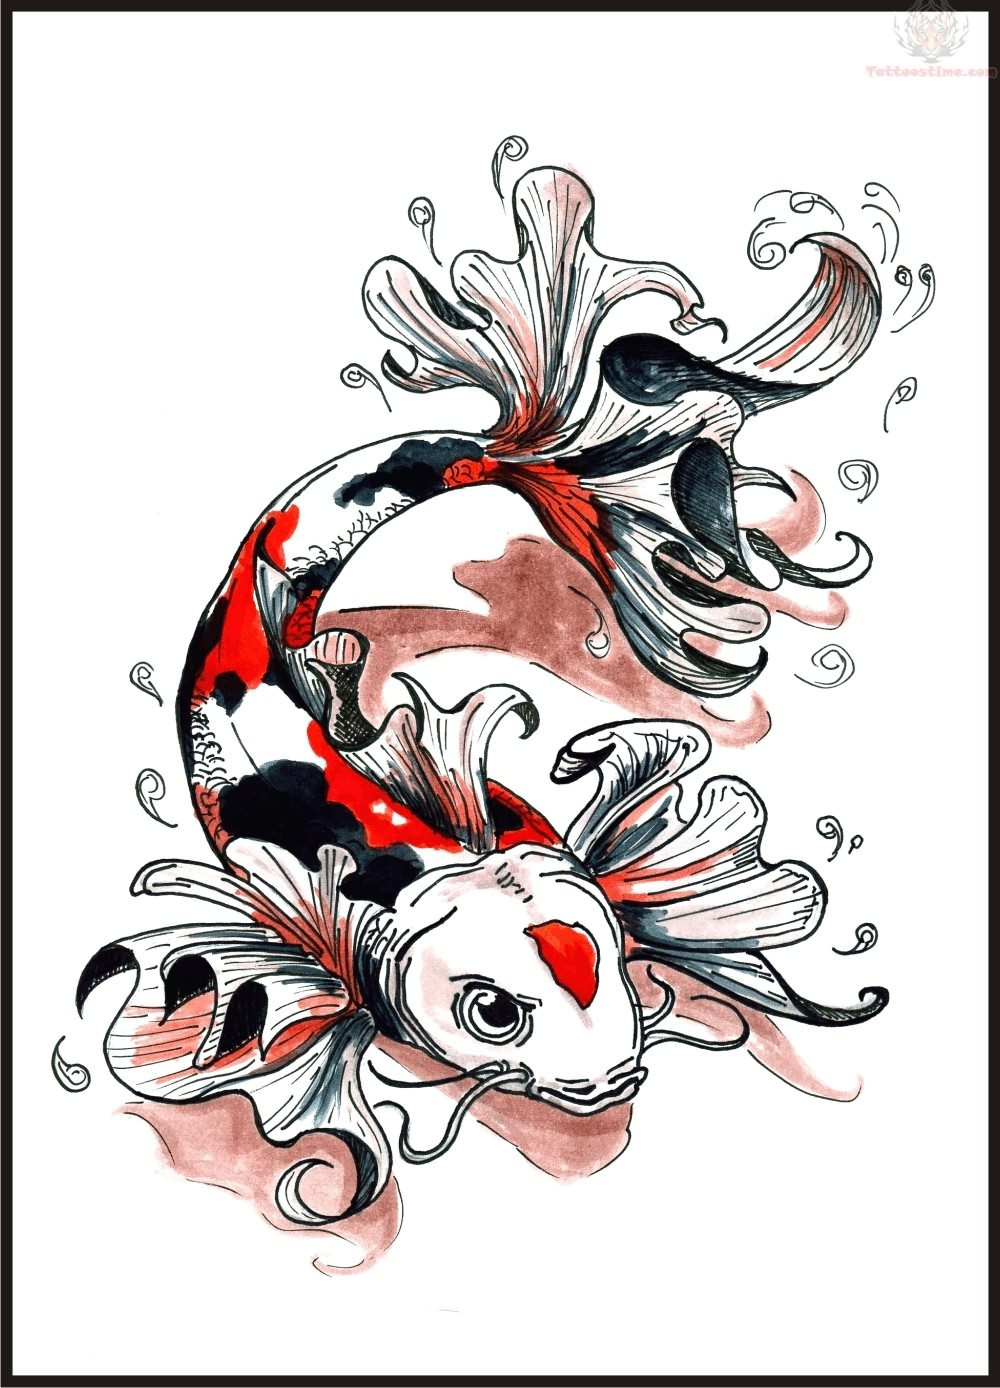 Koi fish tattoo designs for men | Koi Fish Tattoo